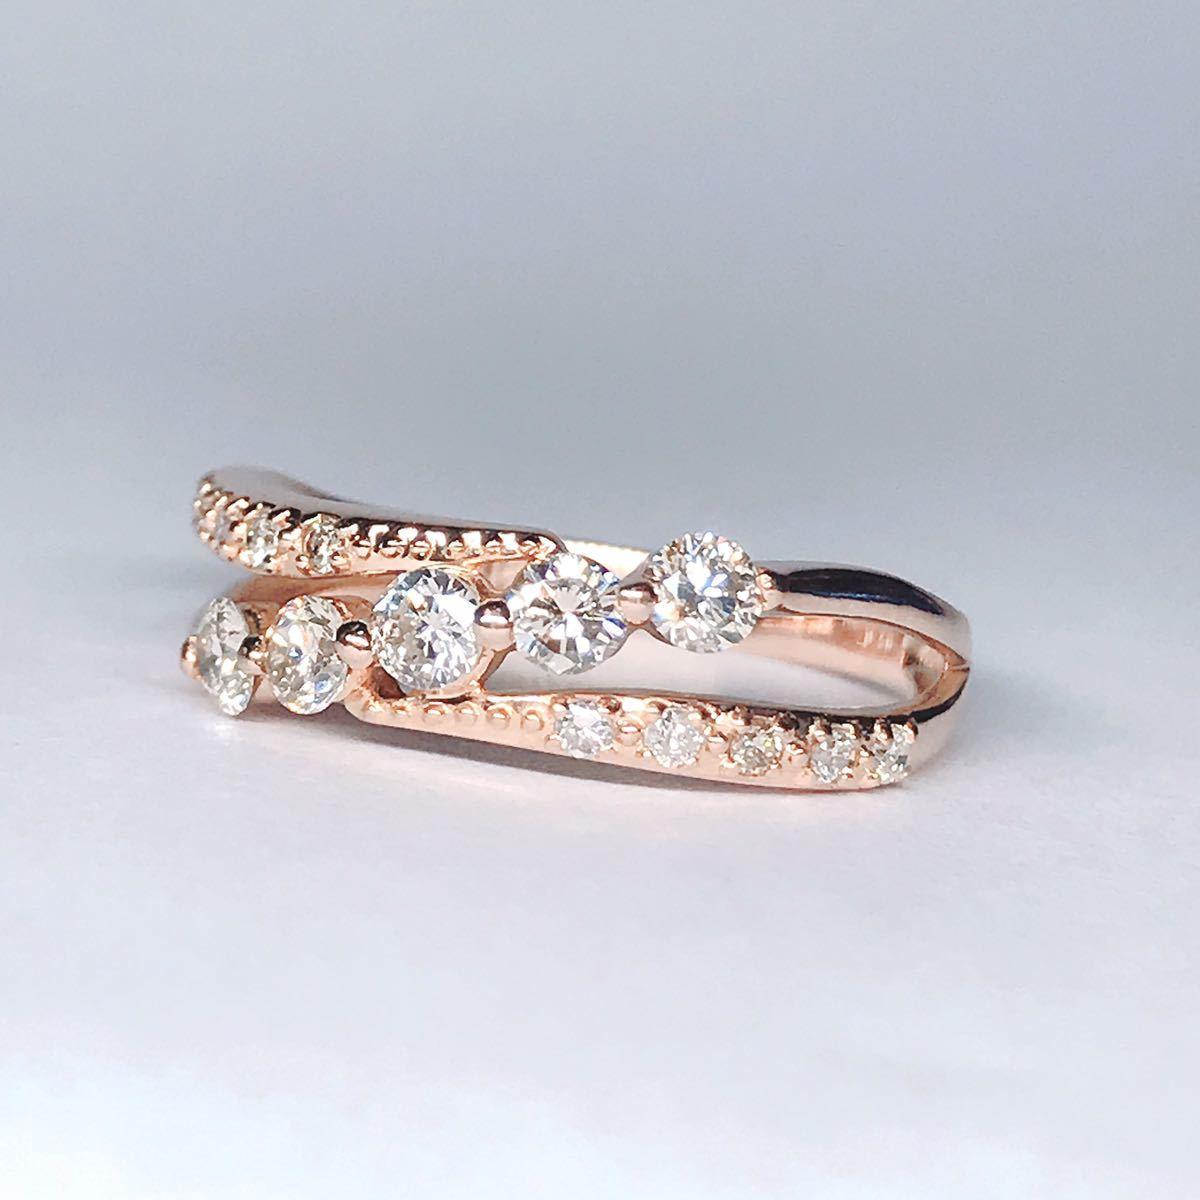 0.50ct ダイヤモンドリング K18 ダイヤ ウェーブ ミル打ち 上品 幅広_画像3